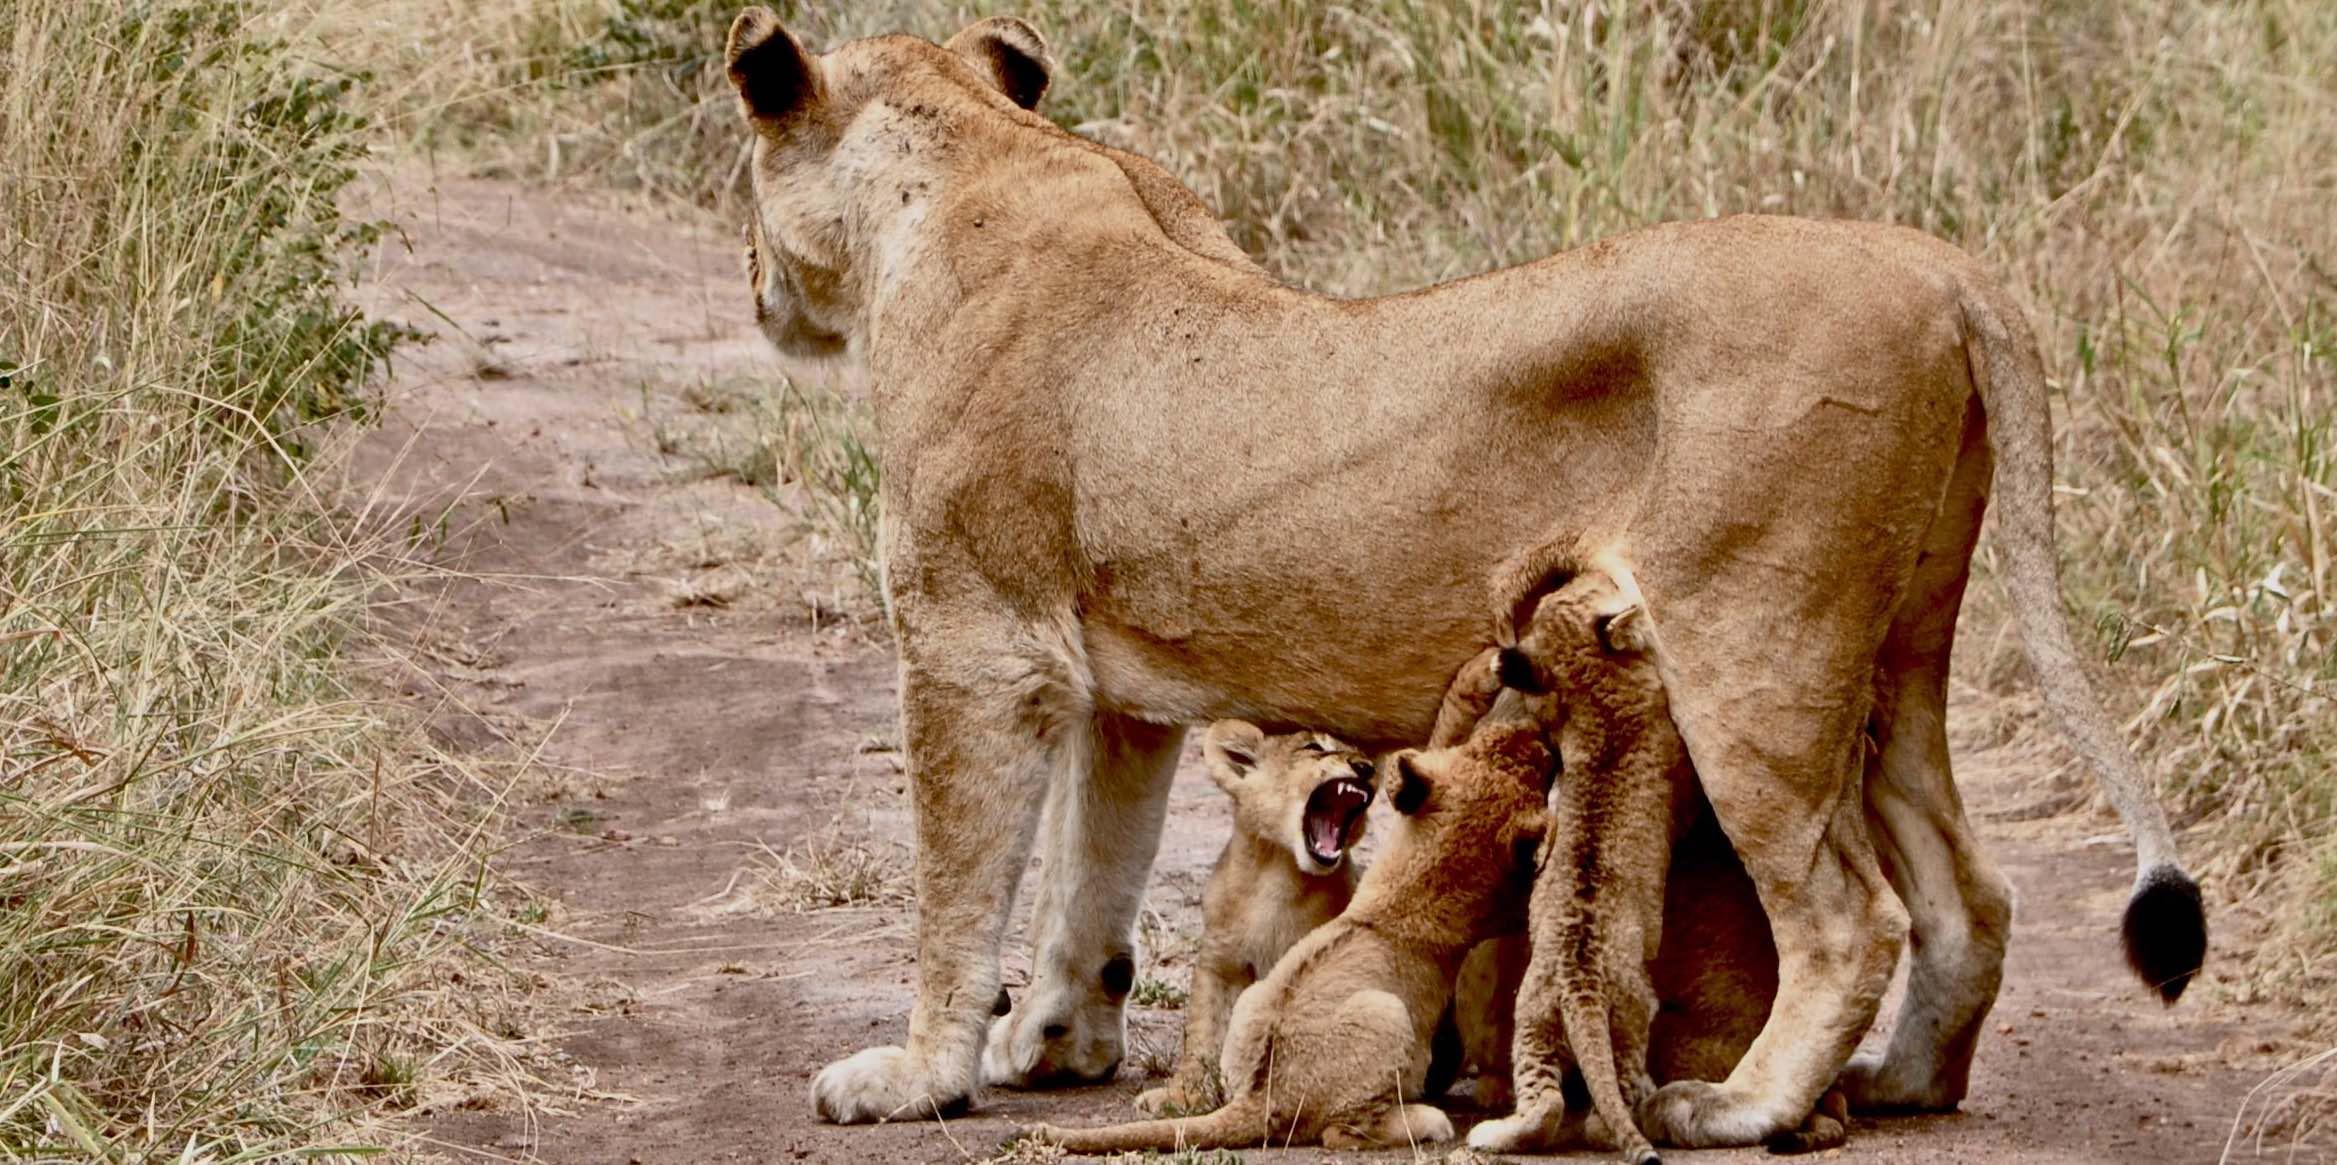 lion2 copy.jpg